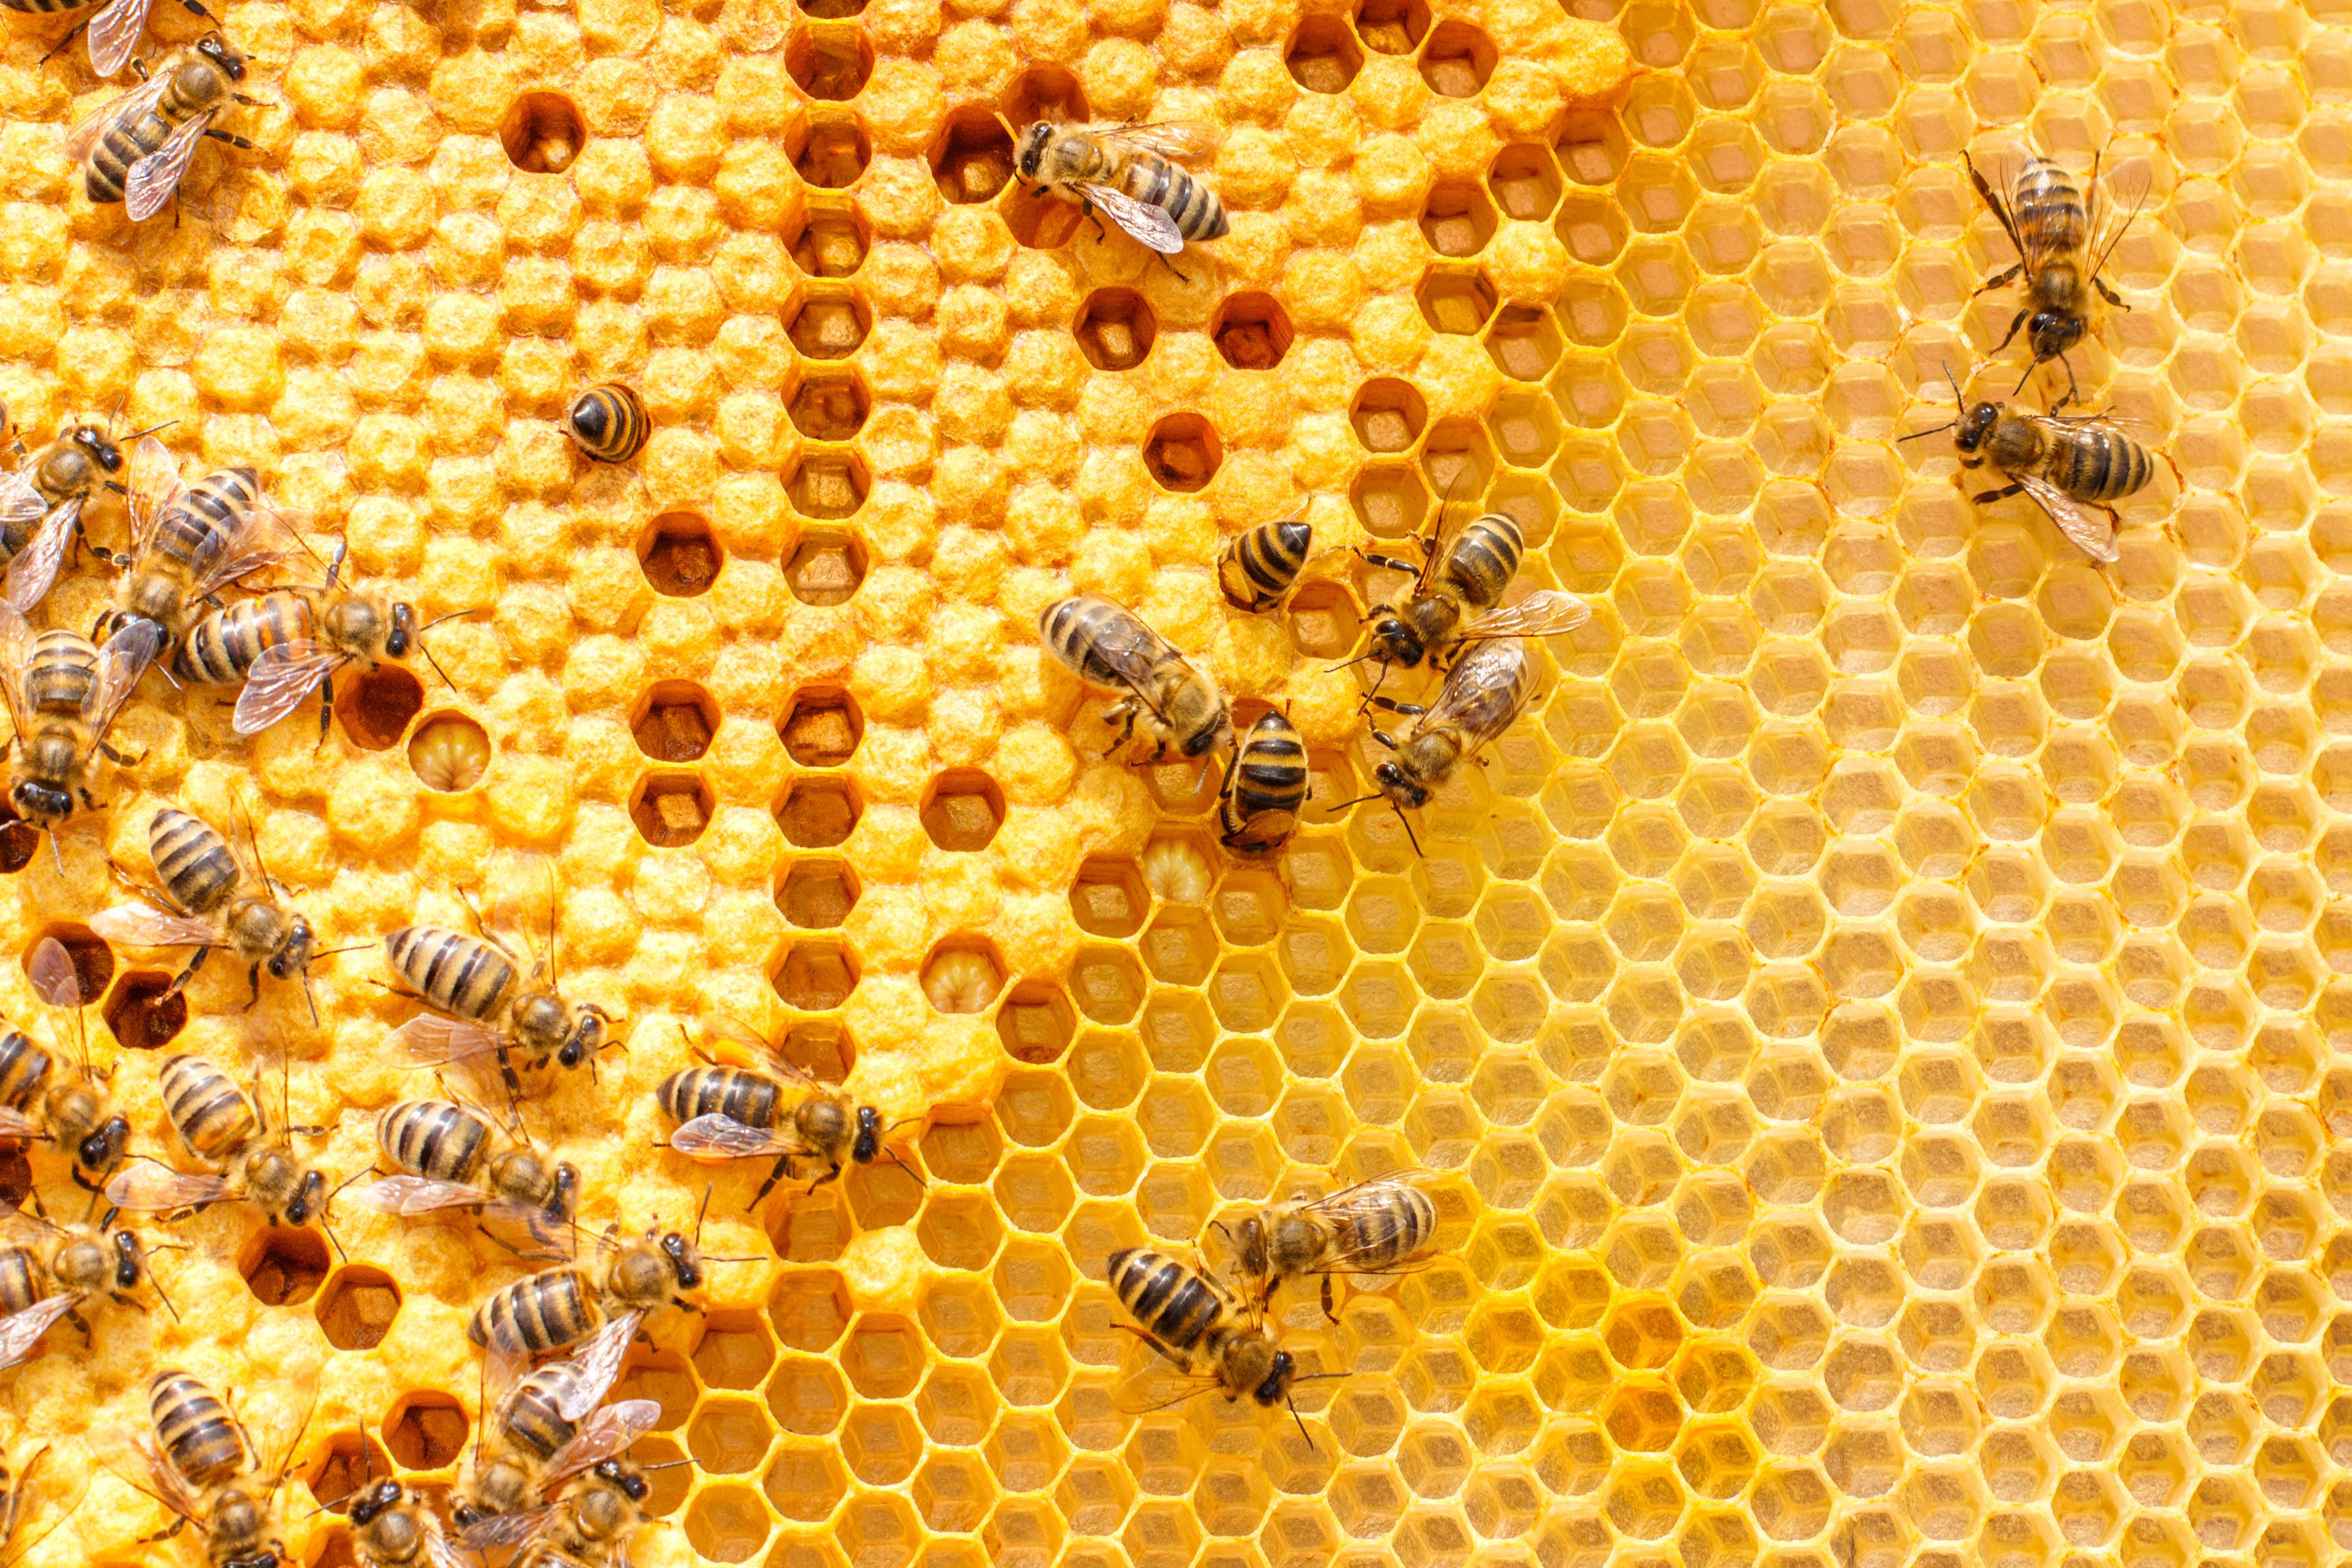 PHC0721_bees-honeycomb.jpg